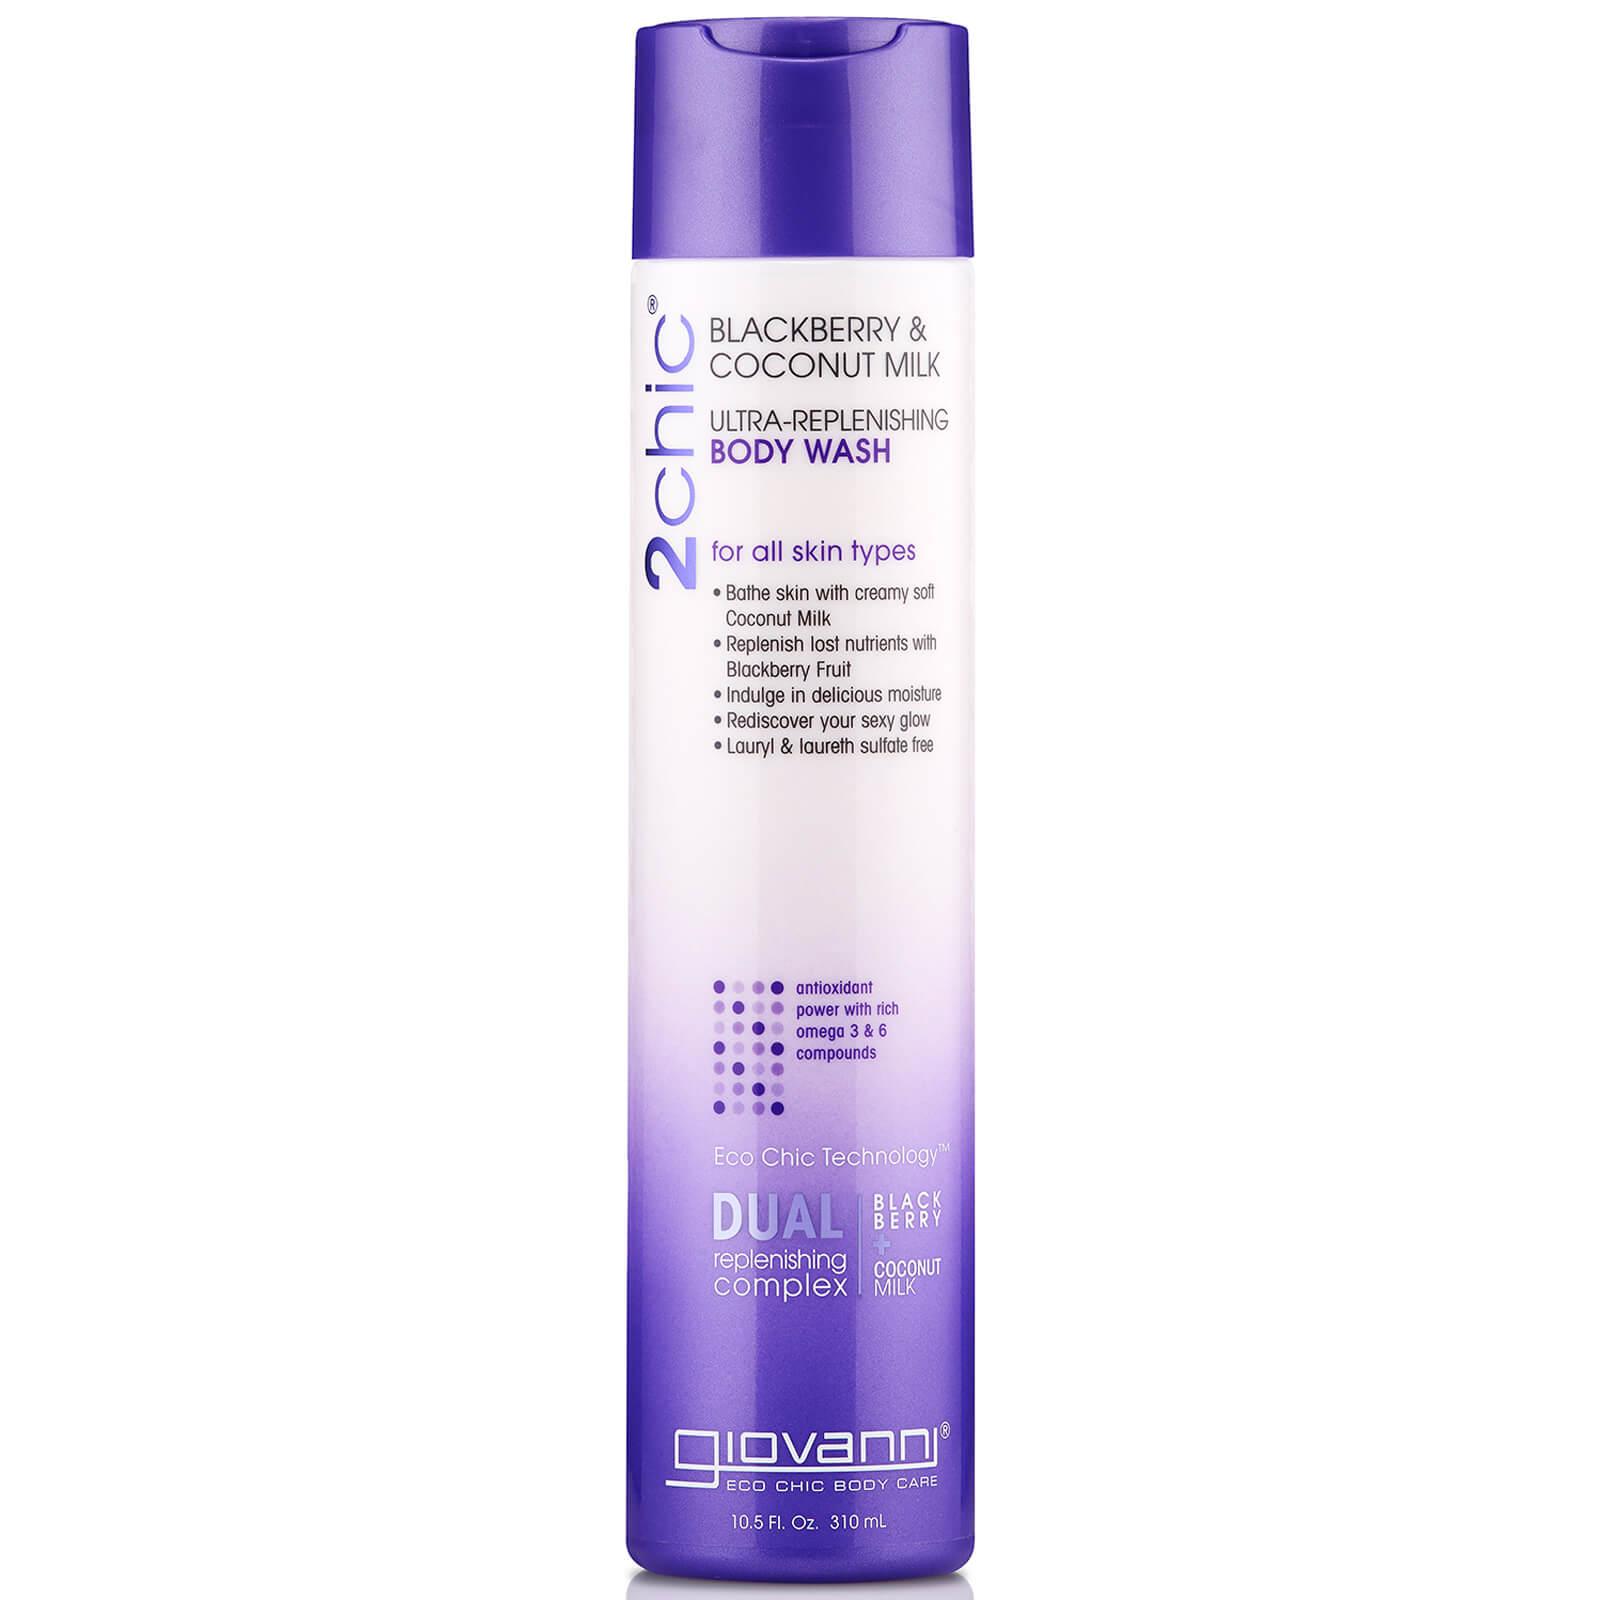 59232907d2d4 Giovanni 2chic Ultra-Replenishing Body Wash 310ml